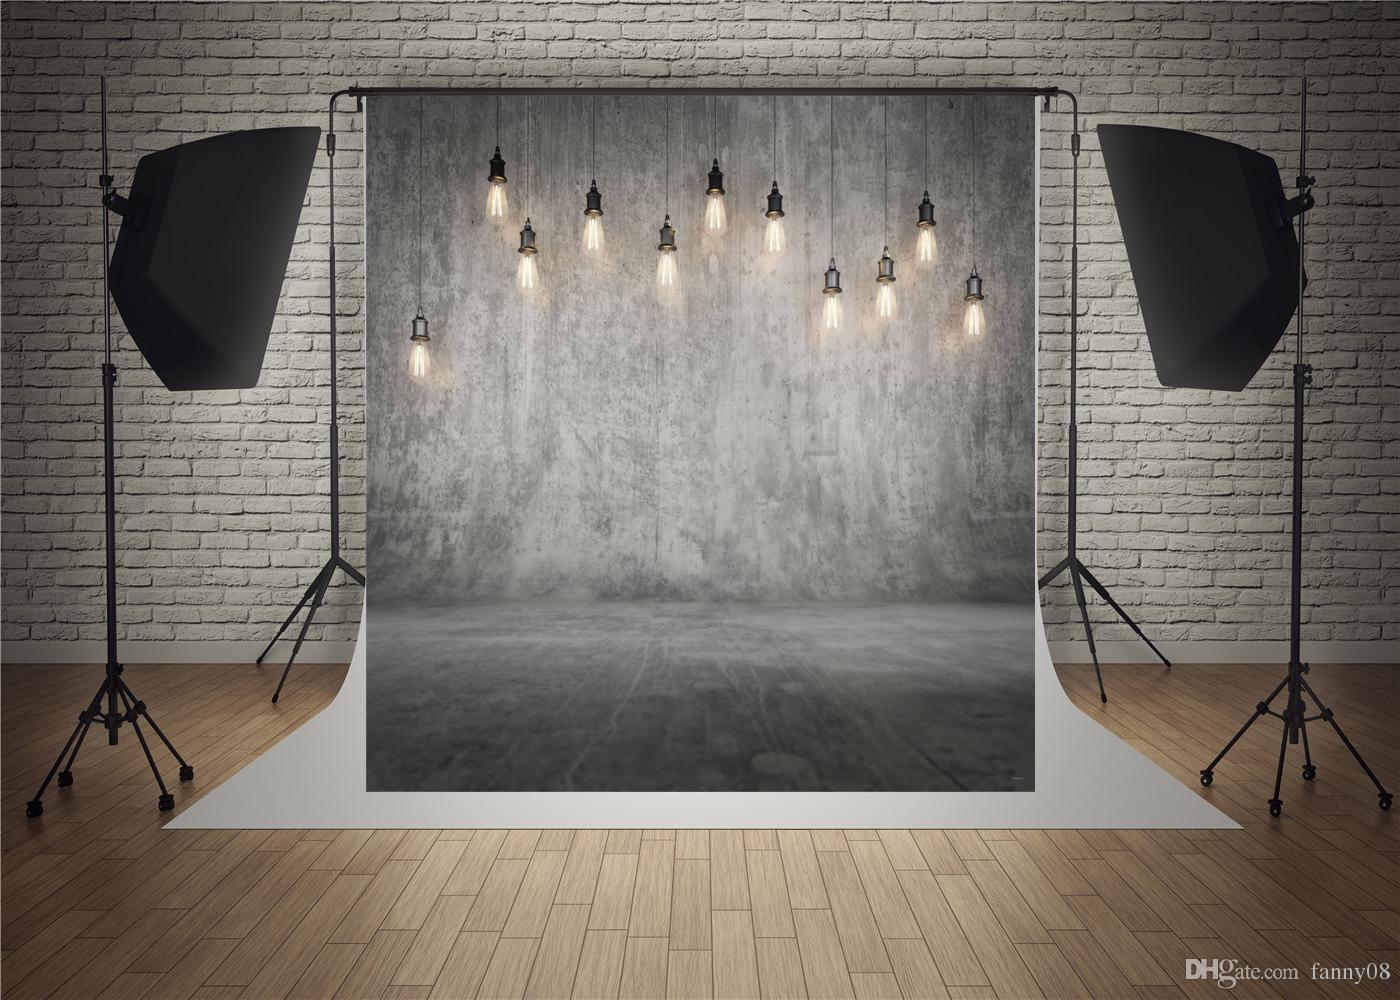 5x7FT Silver Gray Concrete Wall Floor Bulbs Spots Light ...  |Light Photography Background